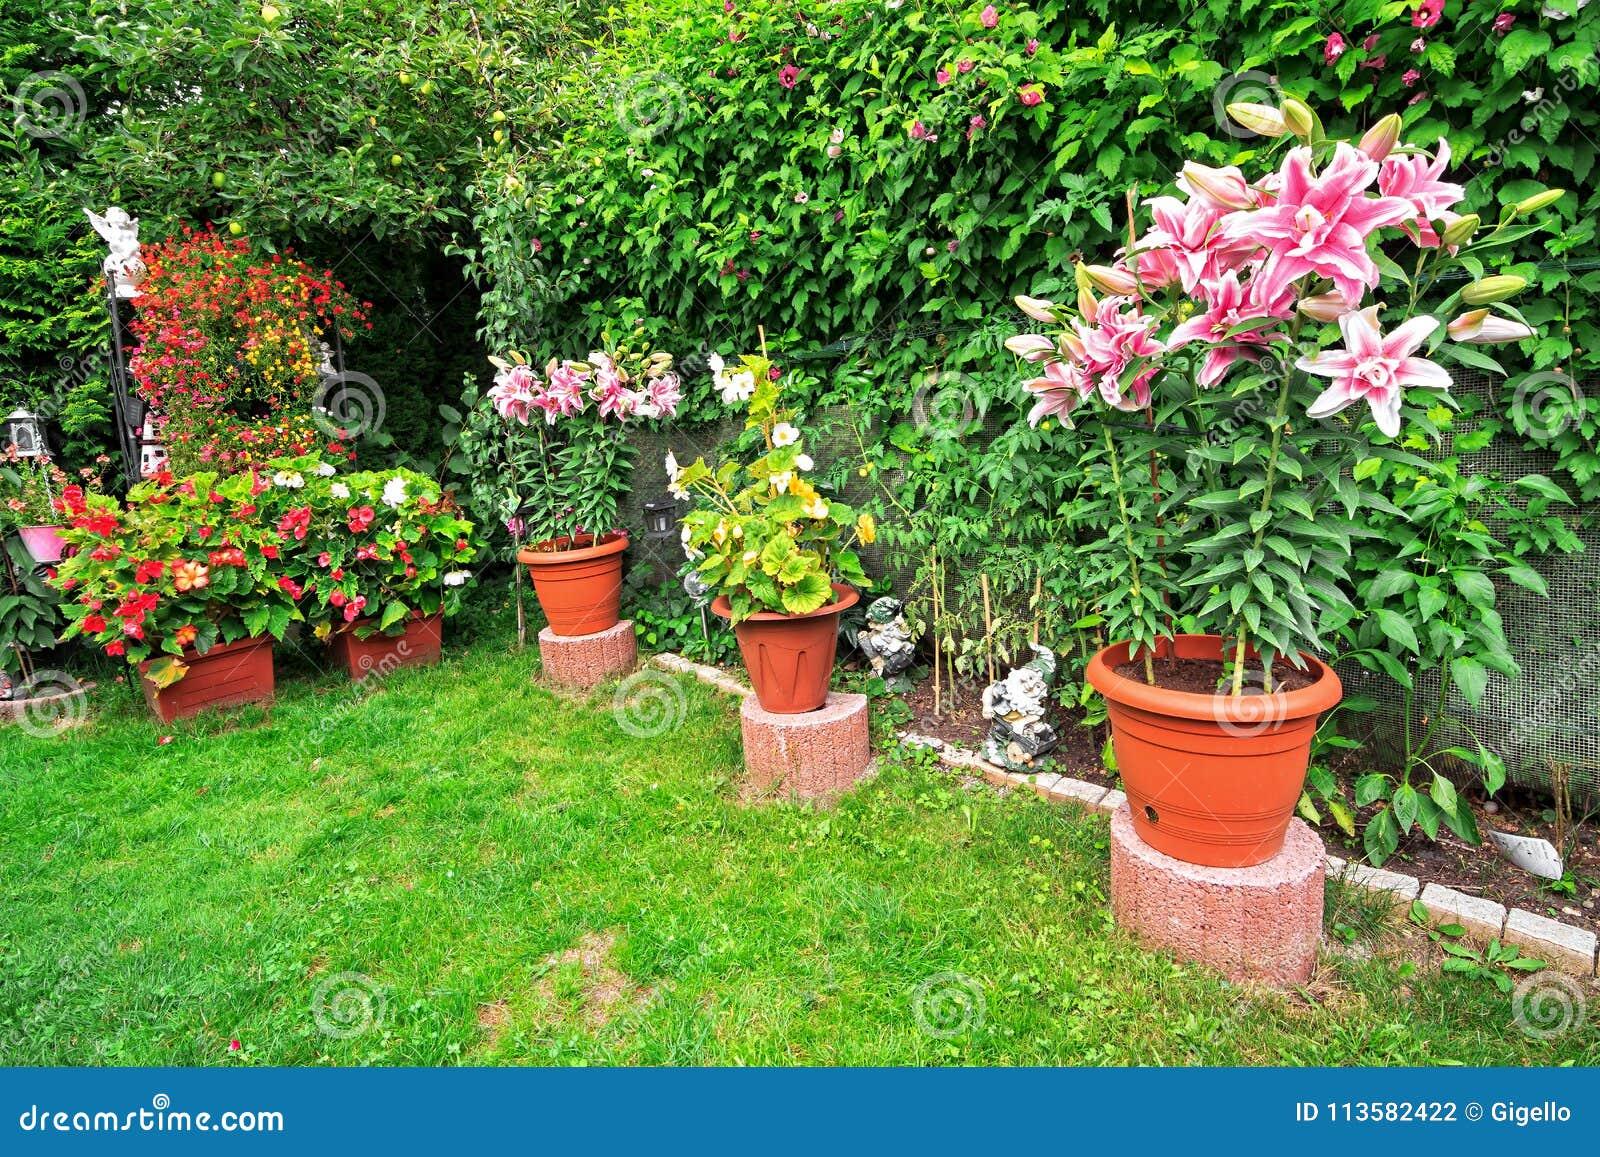 Beautiful Flower Garden And Flower Pot Decorations On Summer Stock